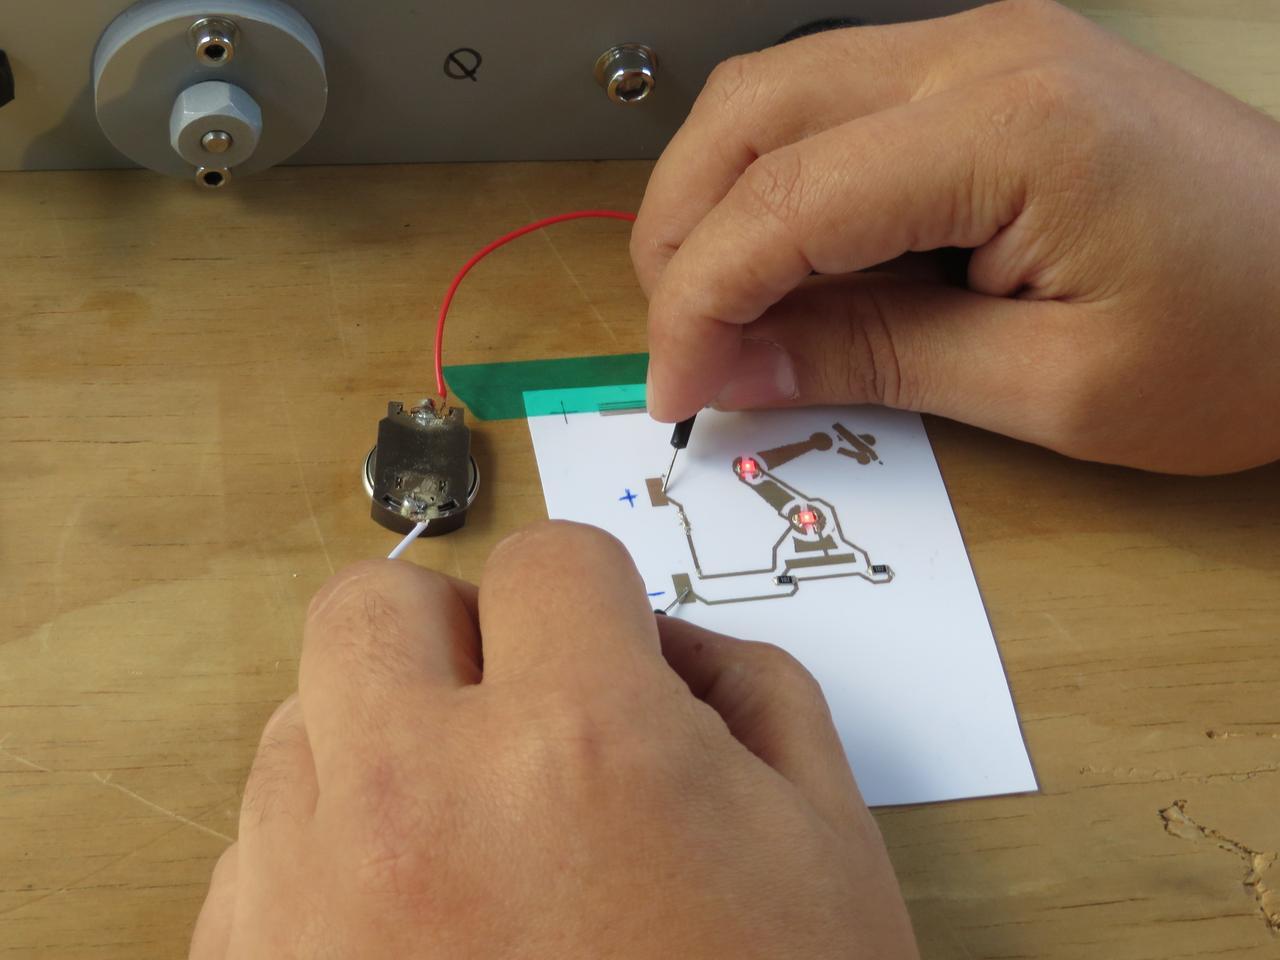 Testing a Squink-made circuit (Photo credit:Eric Mack/Gizmag.com)